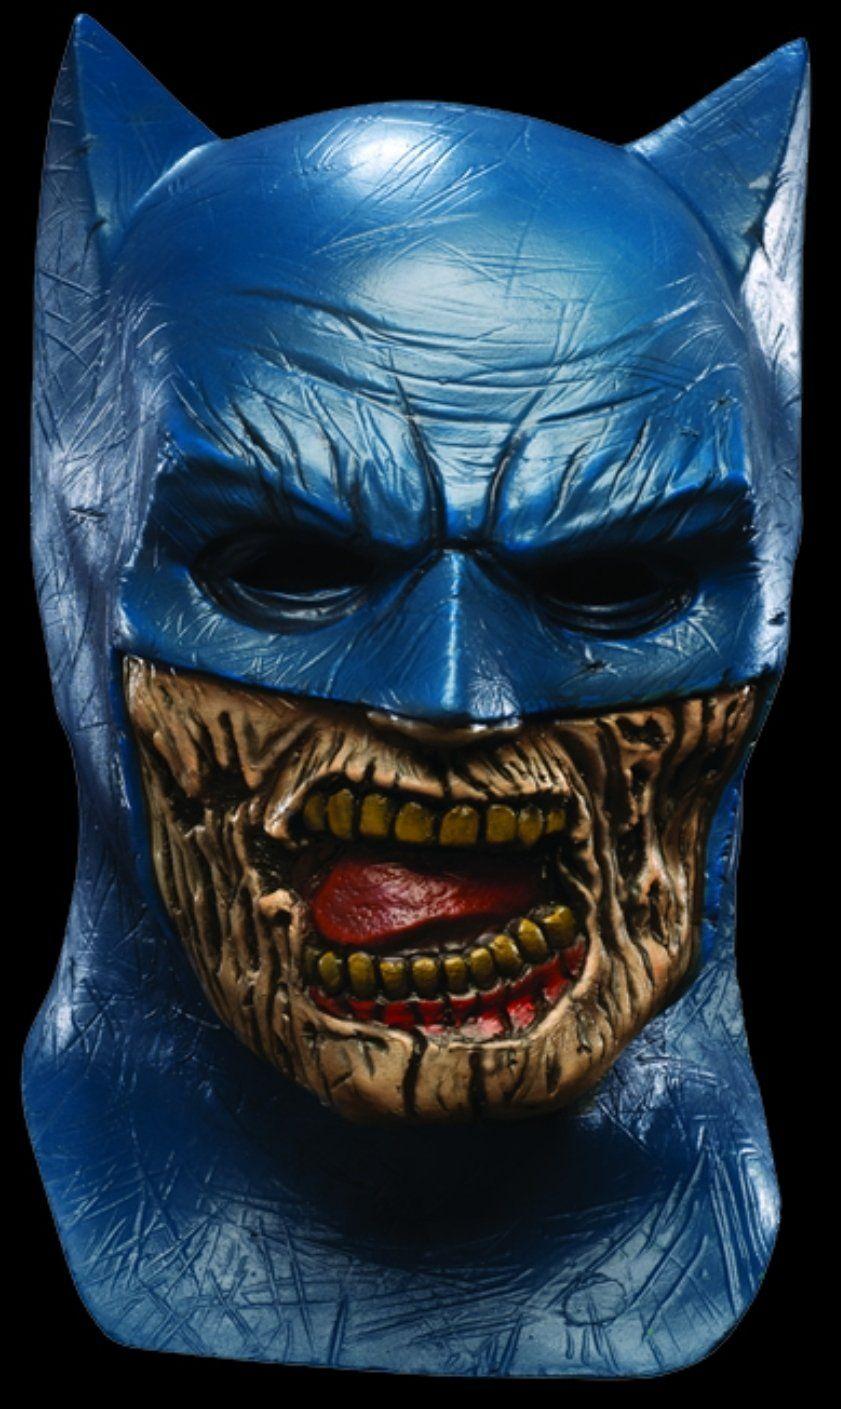 Batman Zombie Mask Batman, Zombie mask, Batman collectibles